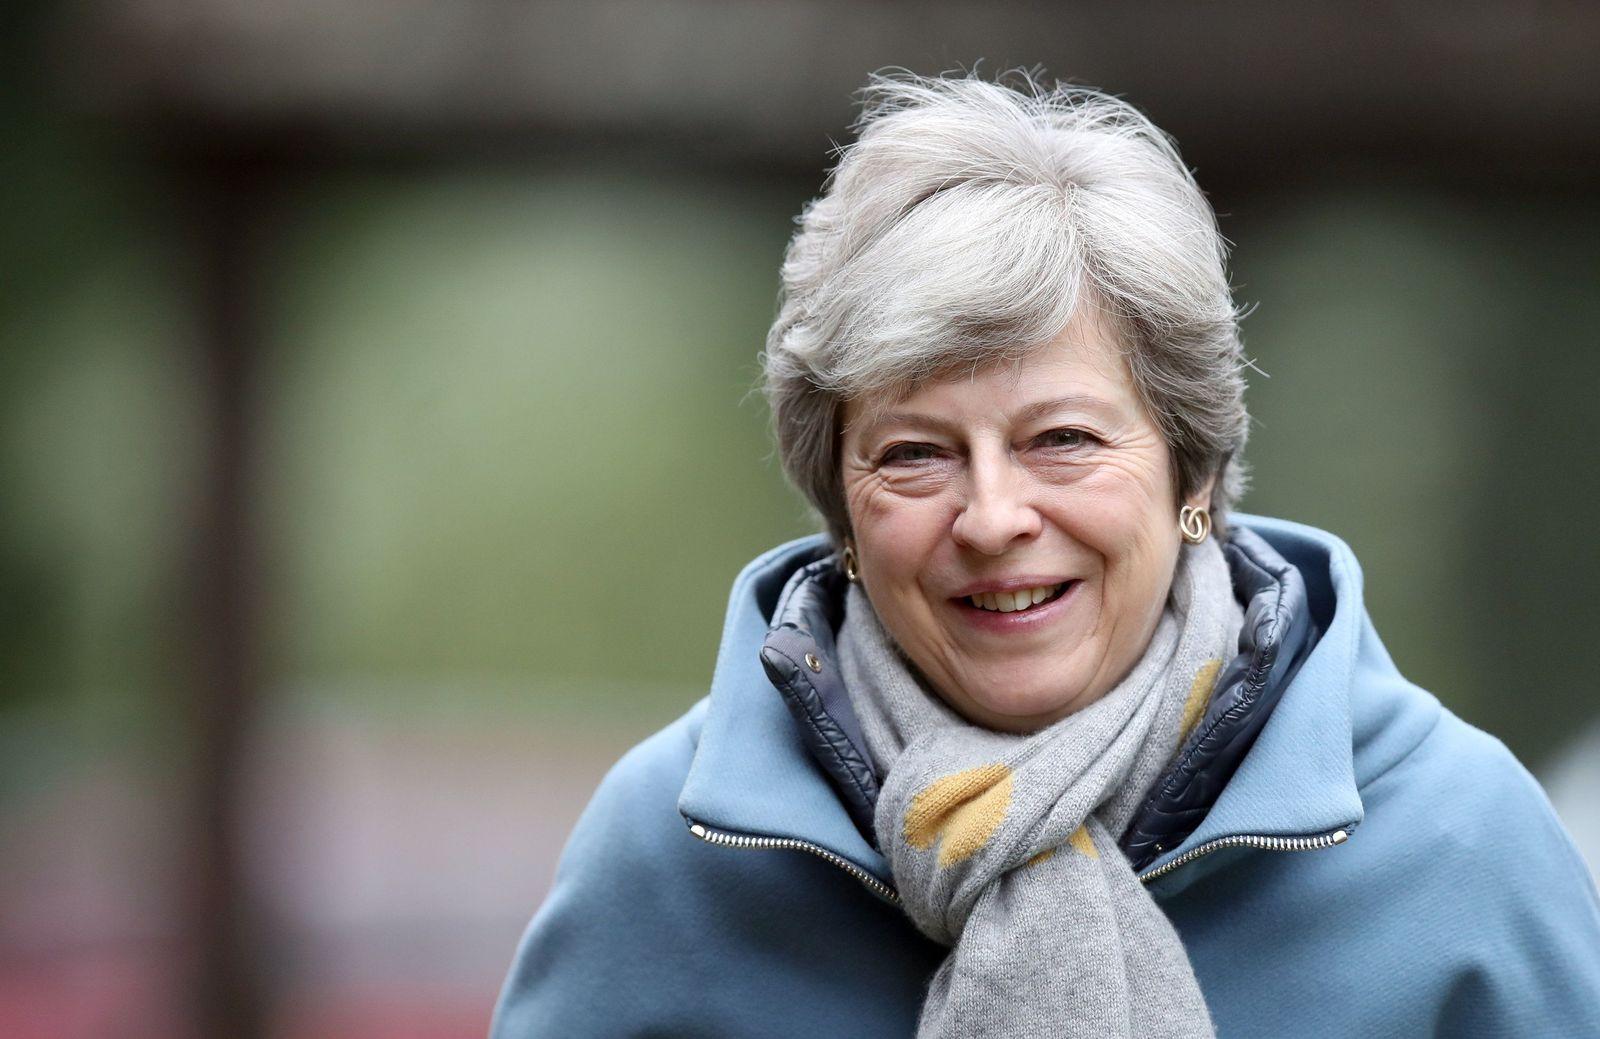 Theresa May attends church